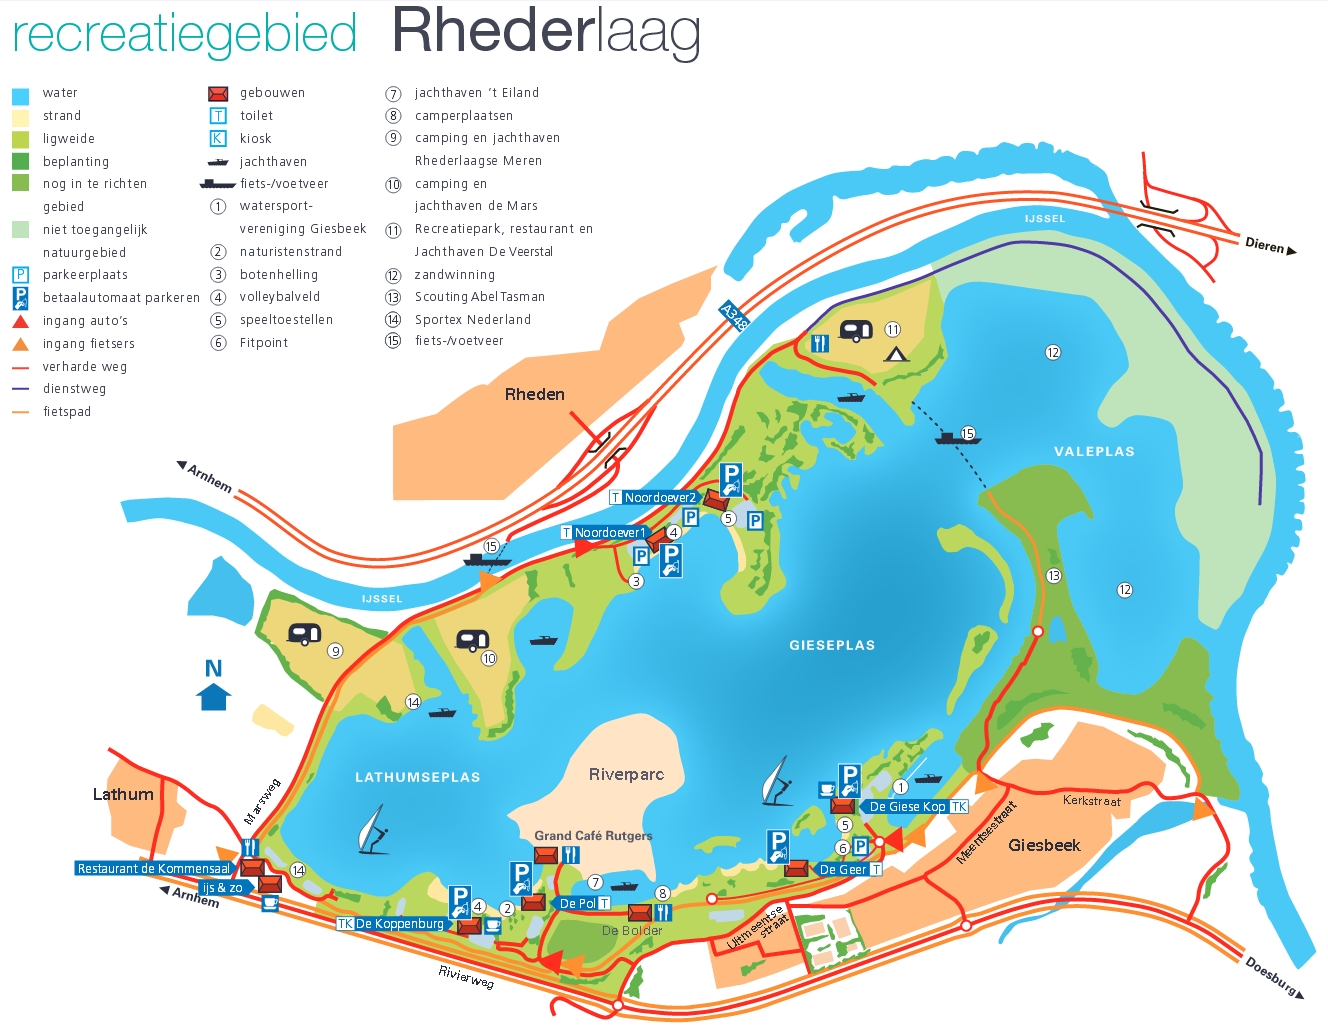 Plattegrond Rhederlaag 2015